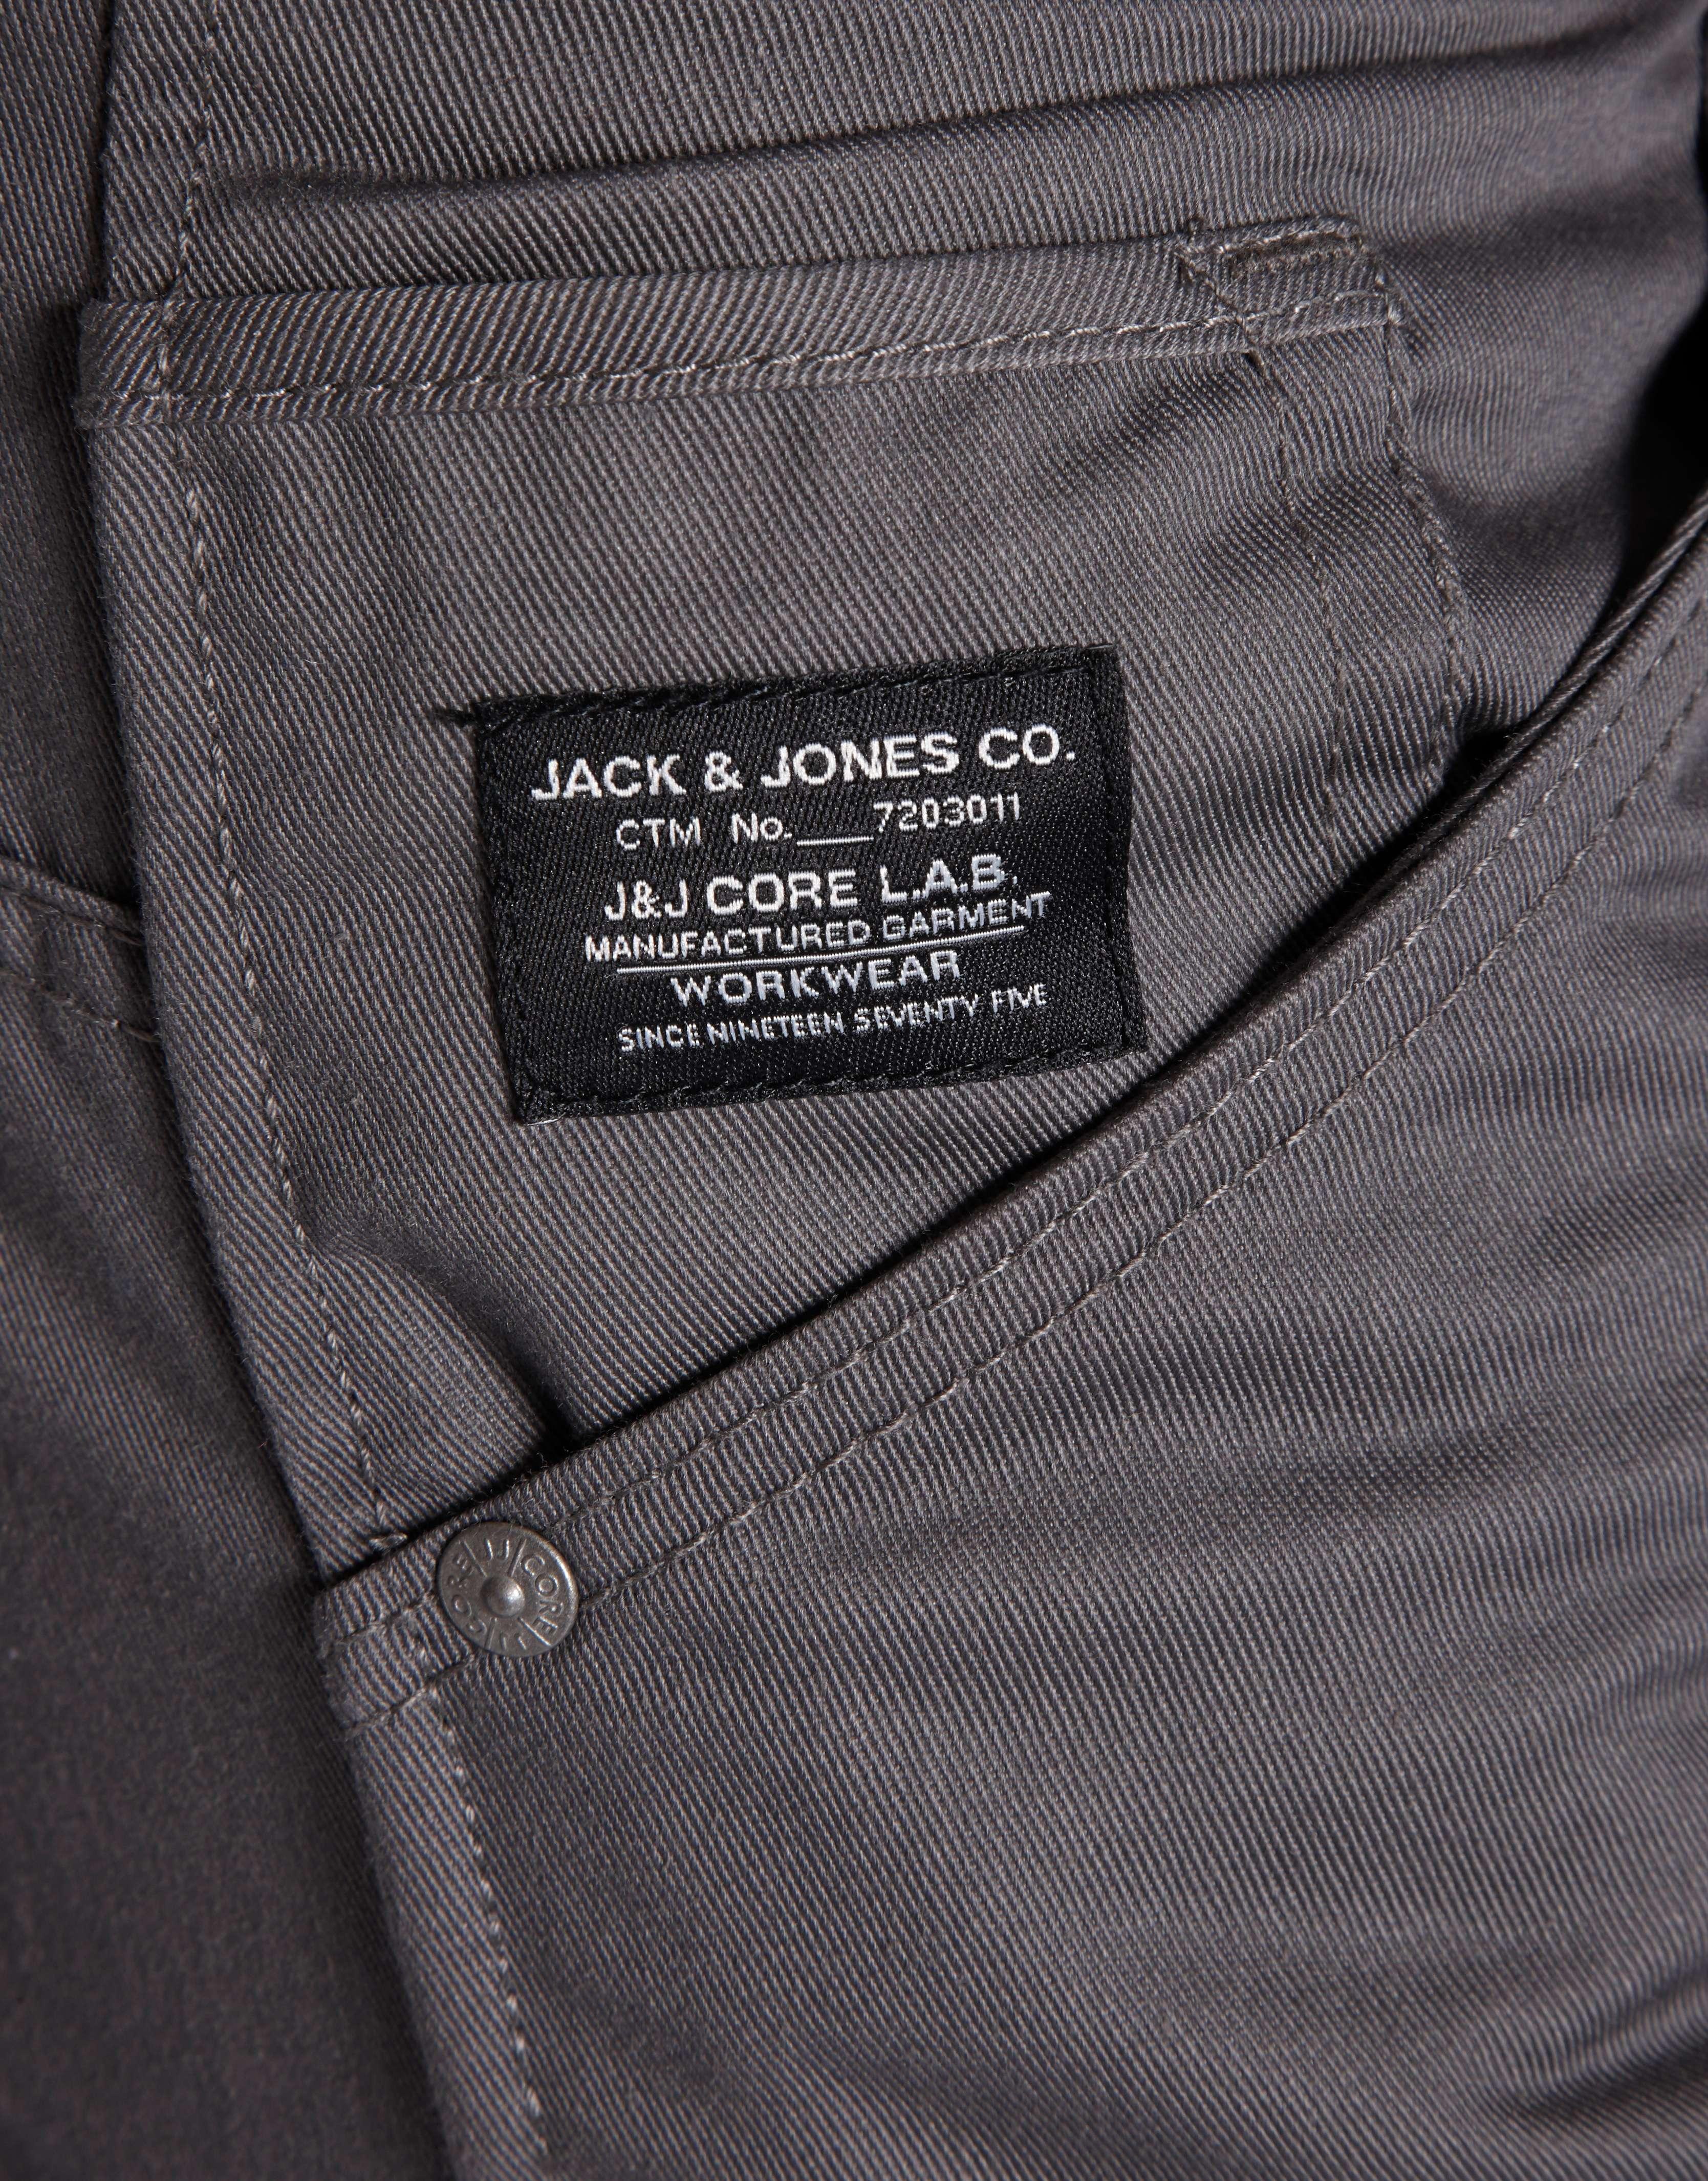 Jack & Jones Core Dale Twisted Chinos